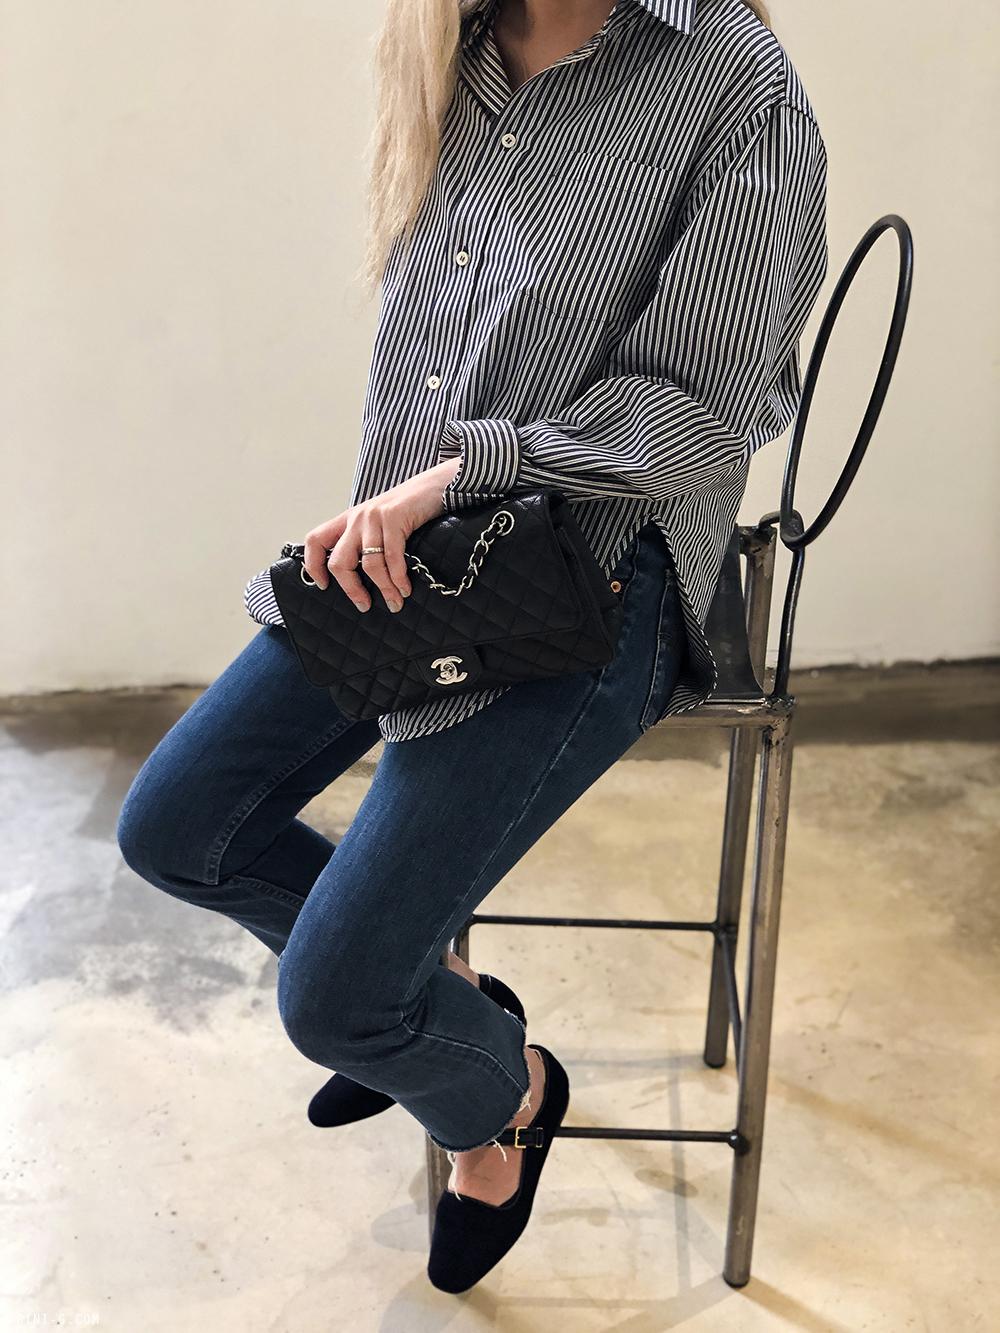 Trini | Levi's 501 jeans Balenciaga striped shirt